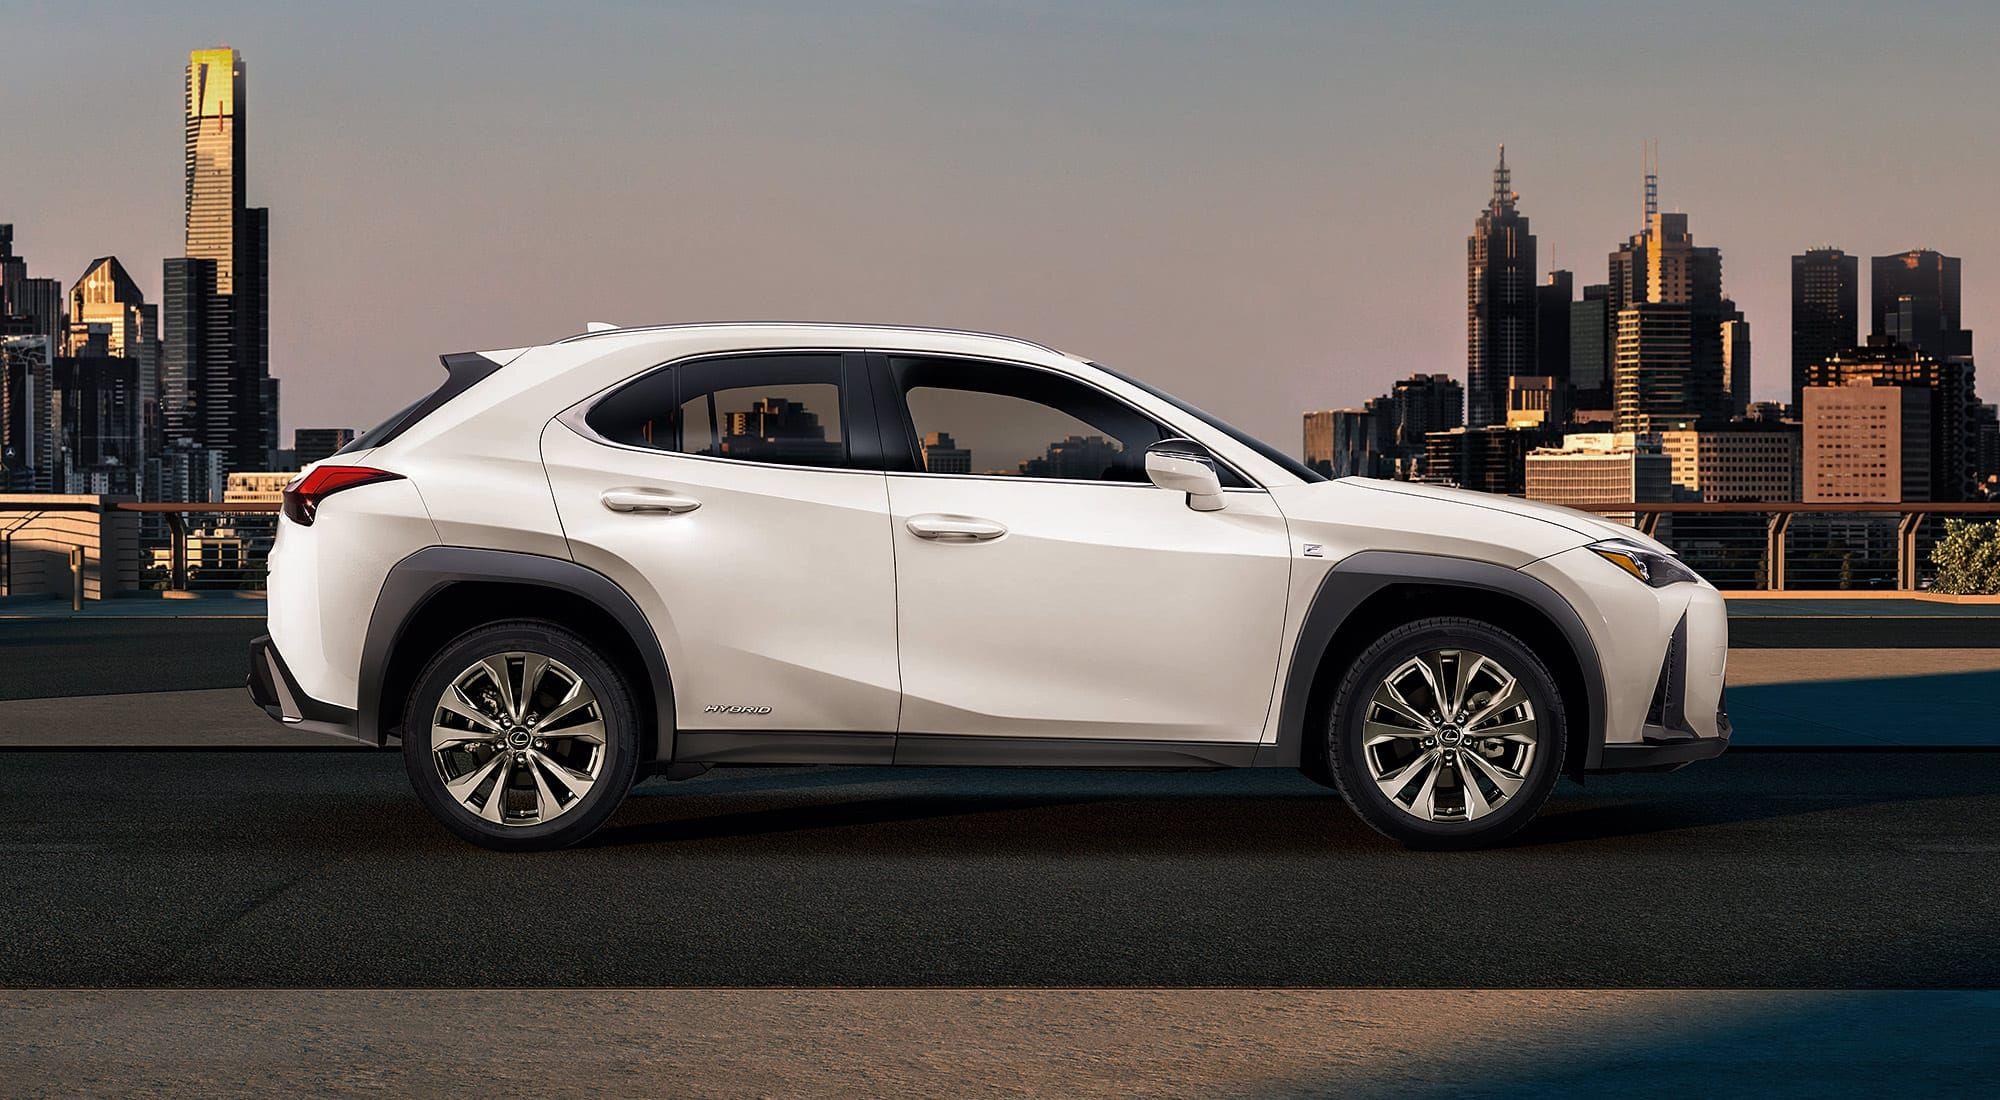 10 Luxury Suvs To Look For In 2019 Lexus Ux Lexus Suv Luxury Suv Lexus